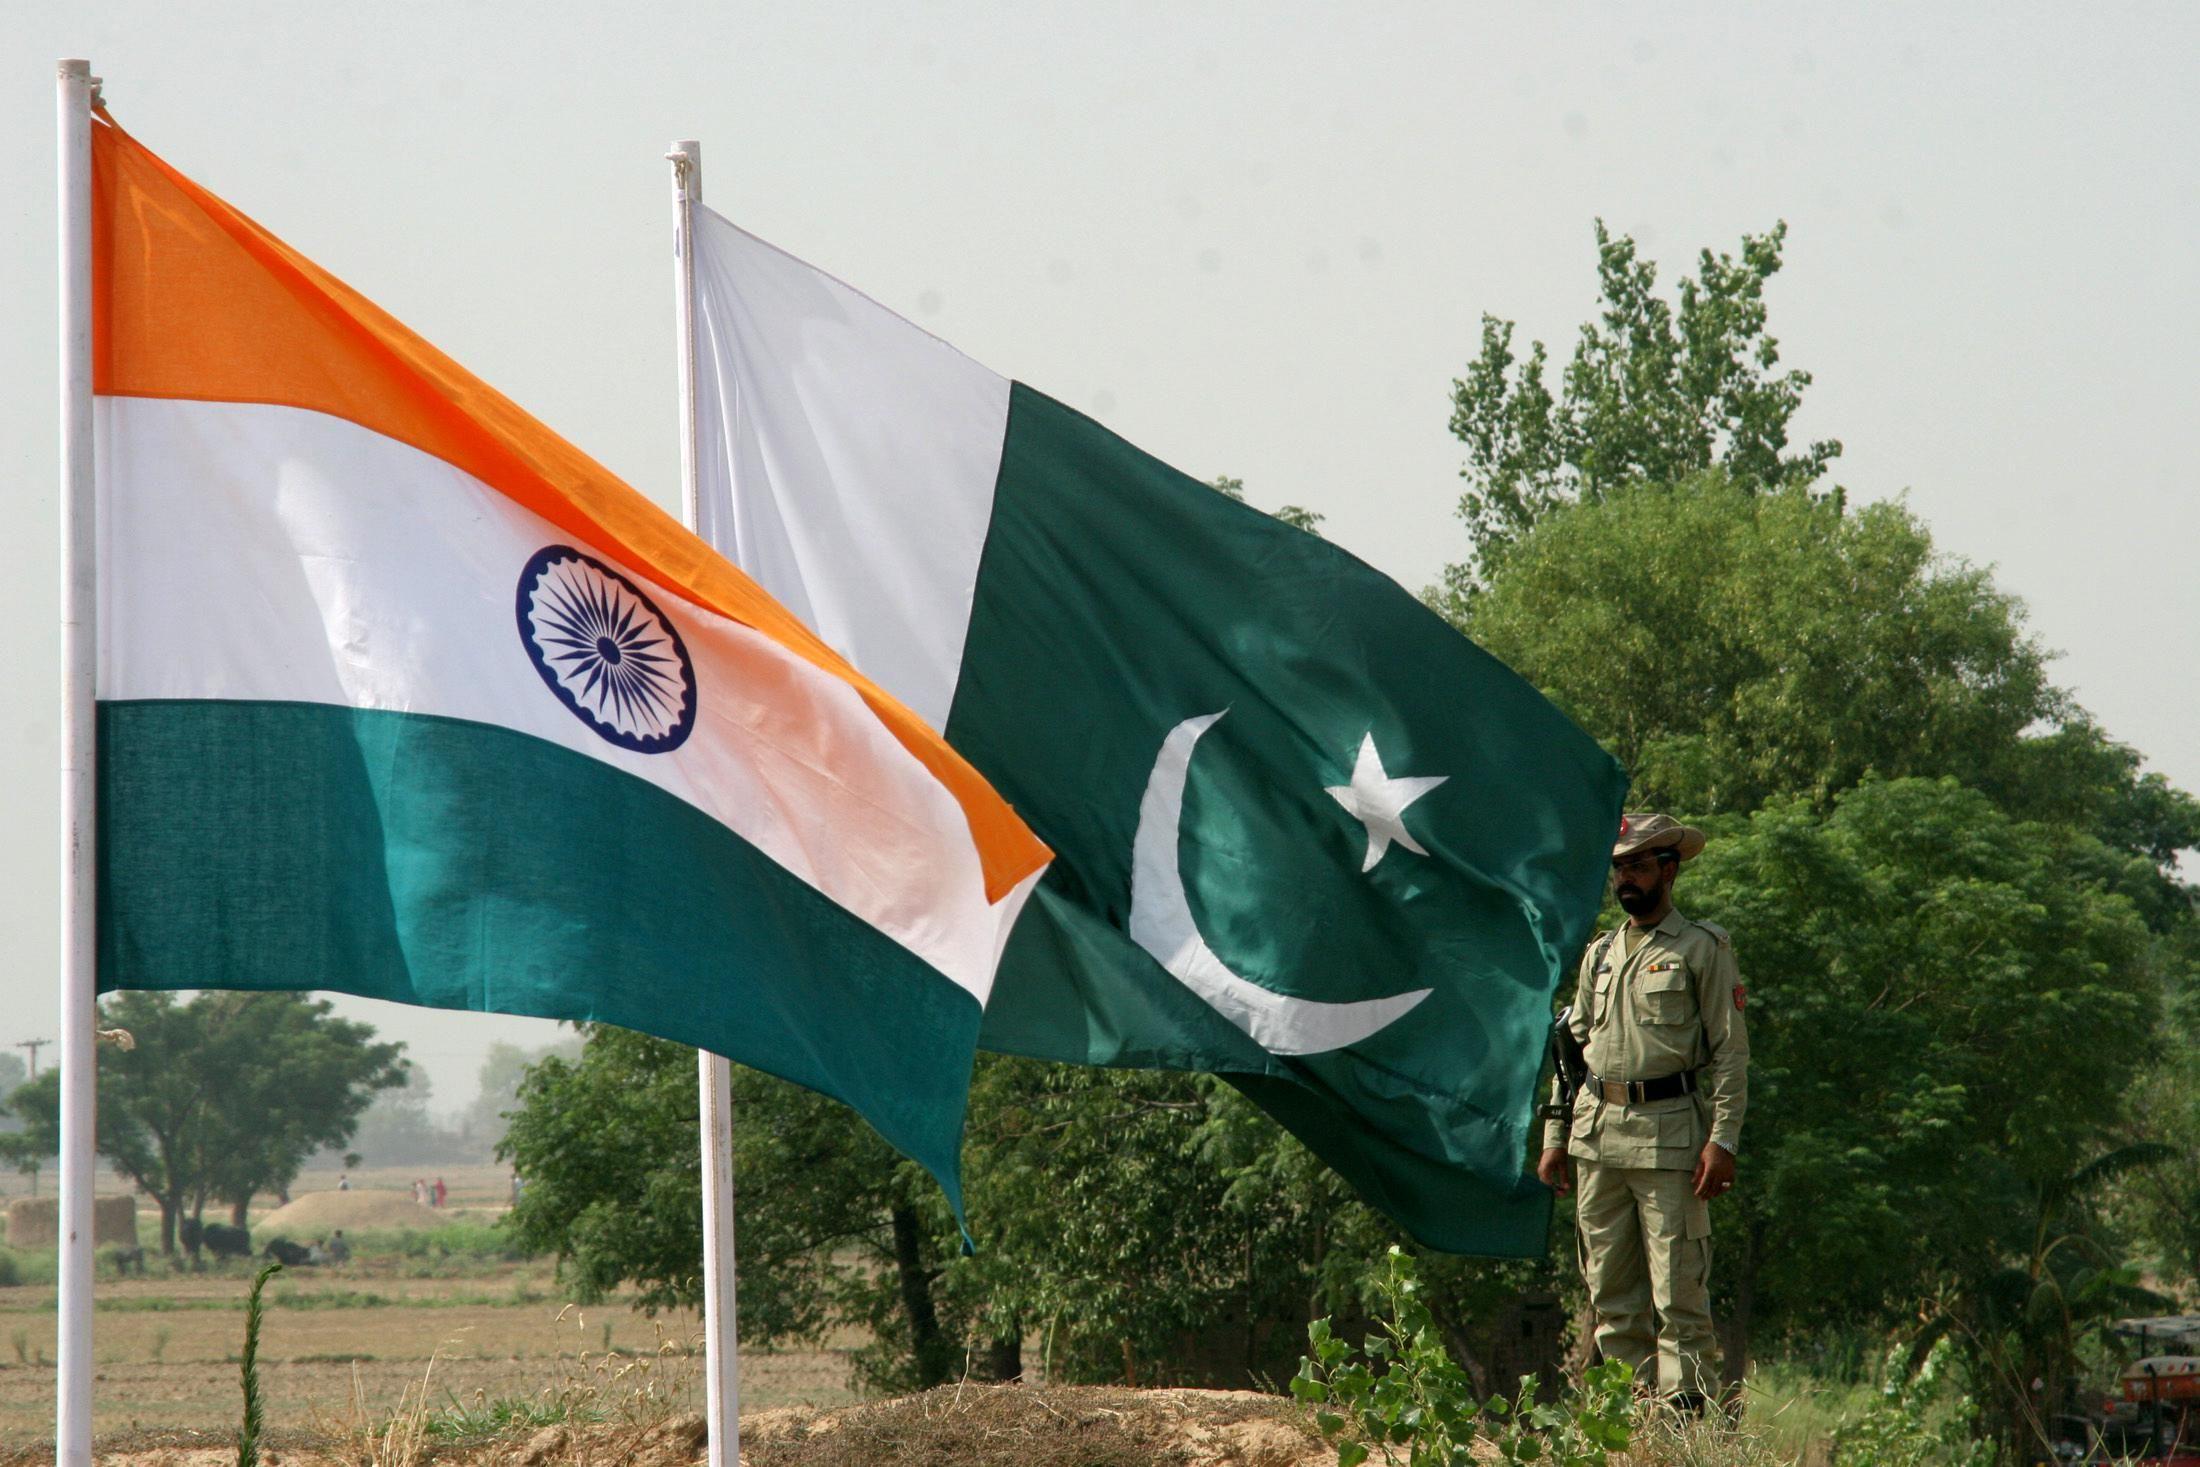 What we're watching: India and Pakistan talk water, Saudis float Yemen ceasefire, Polish writer in peril